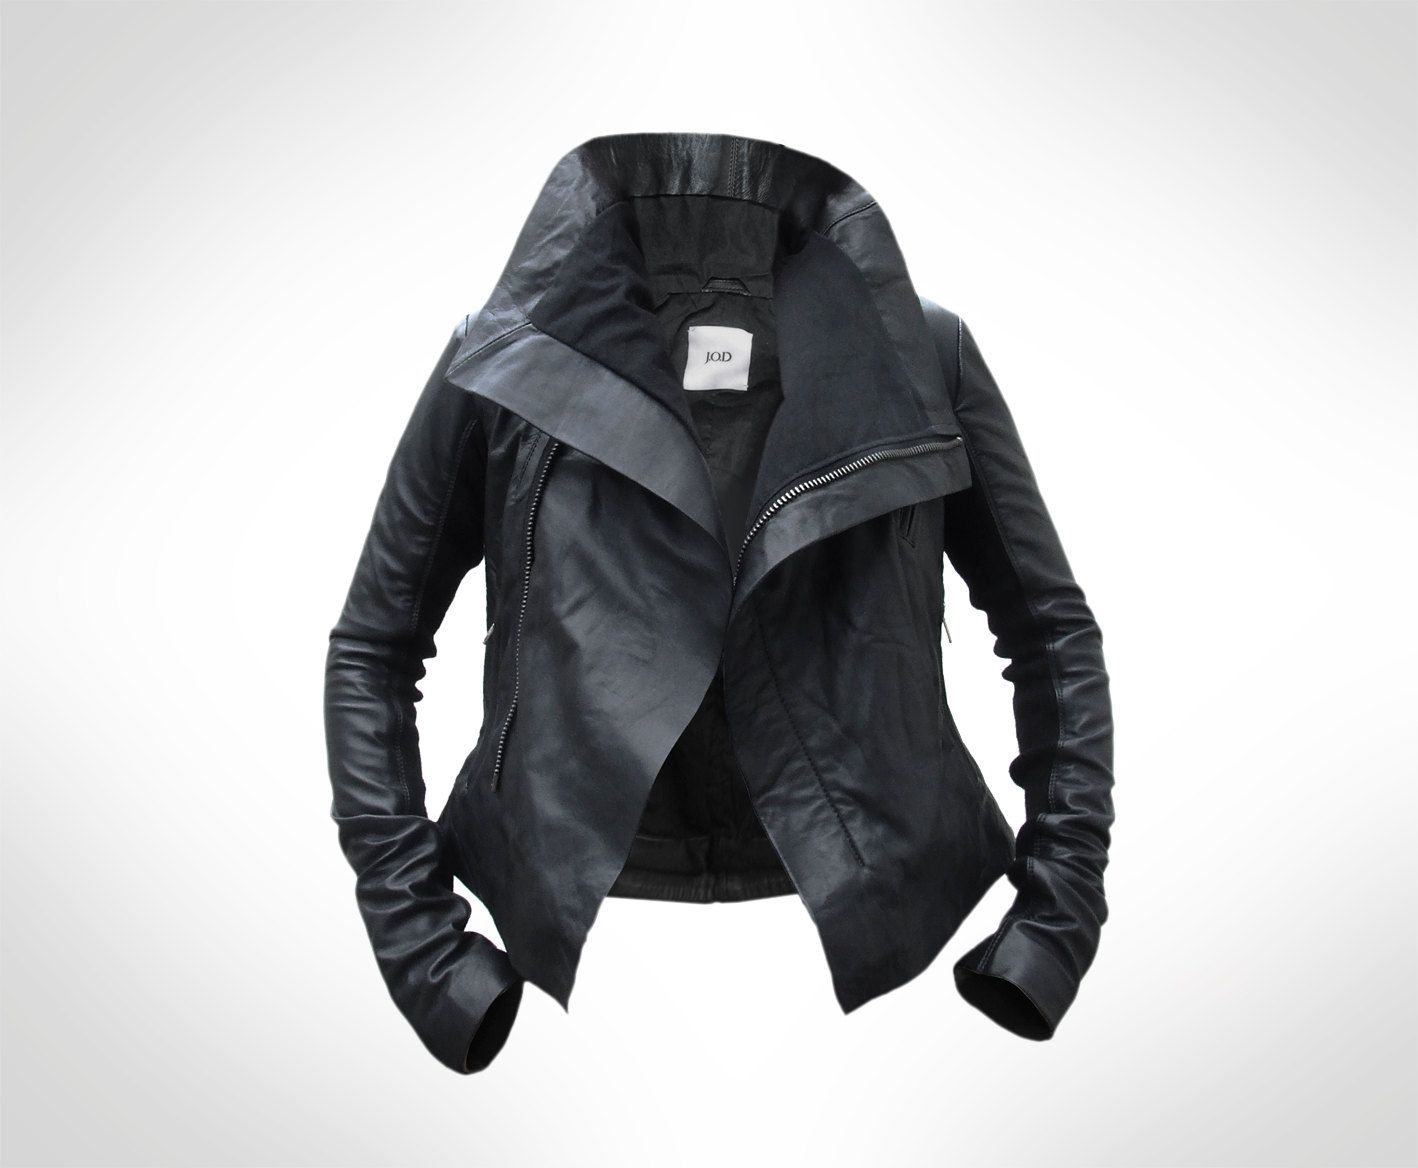 Custom Black Leather Biker Jacket by J.O.D by JODClothing on Etsy, €295.00